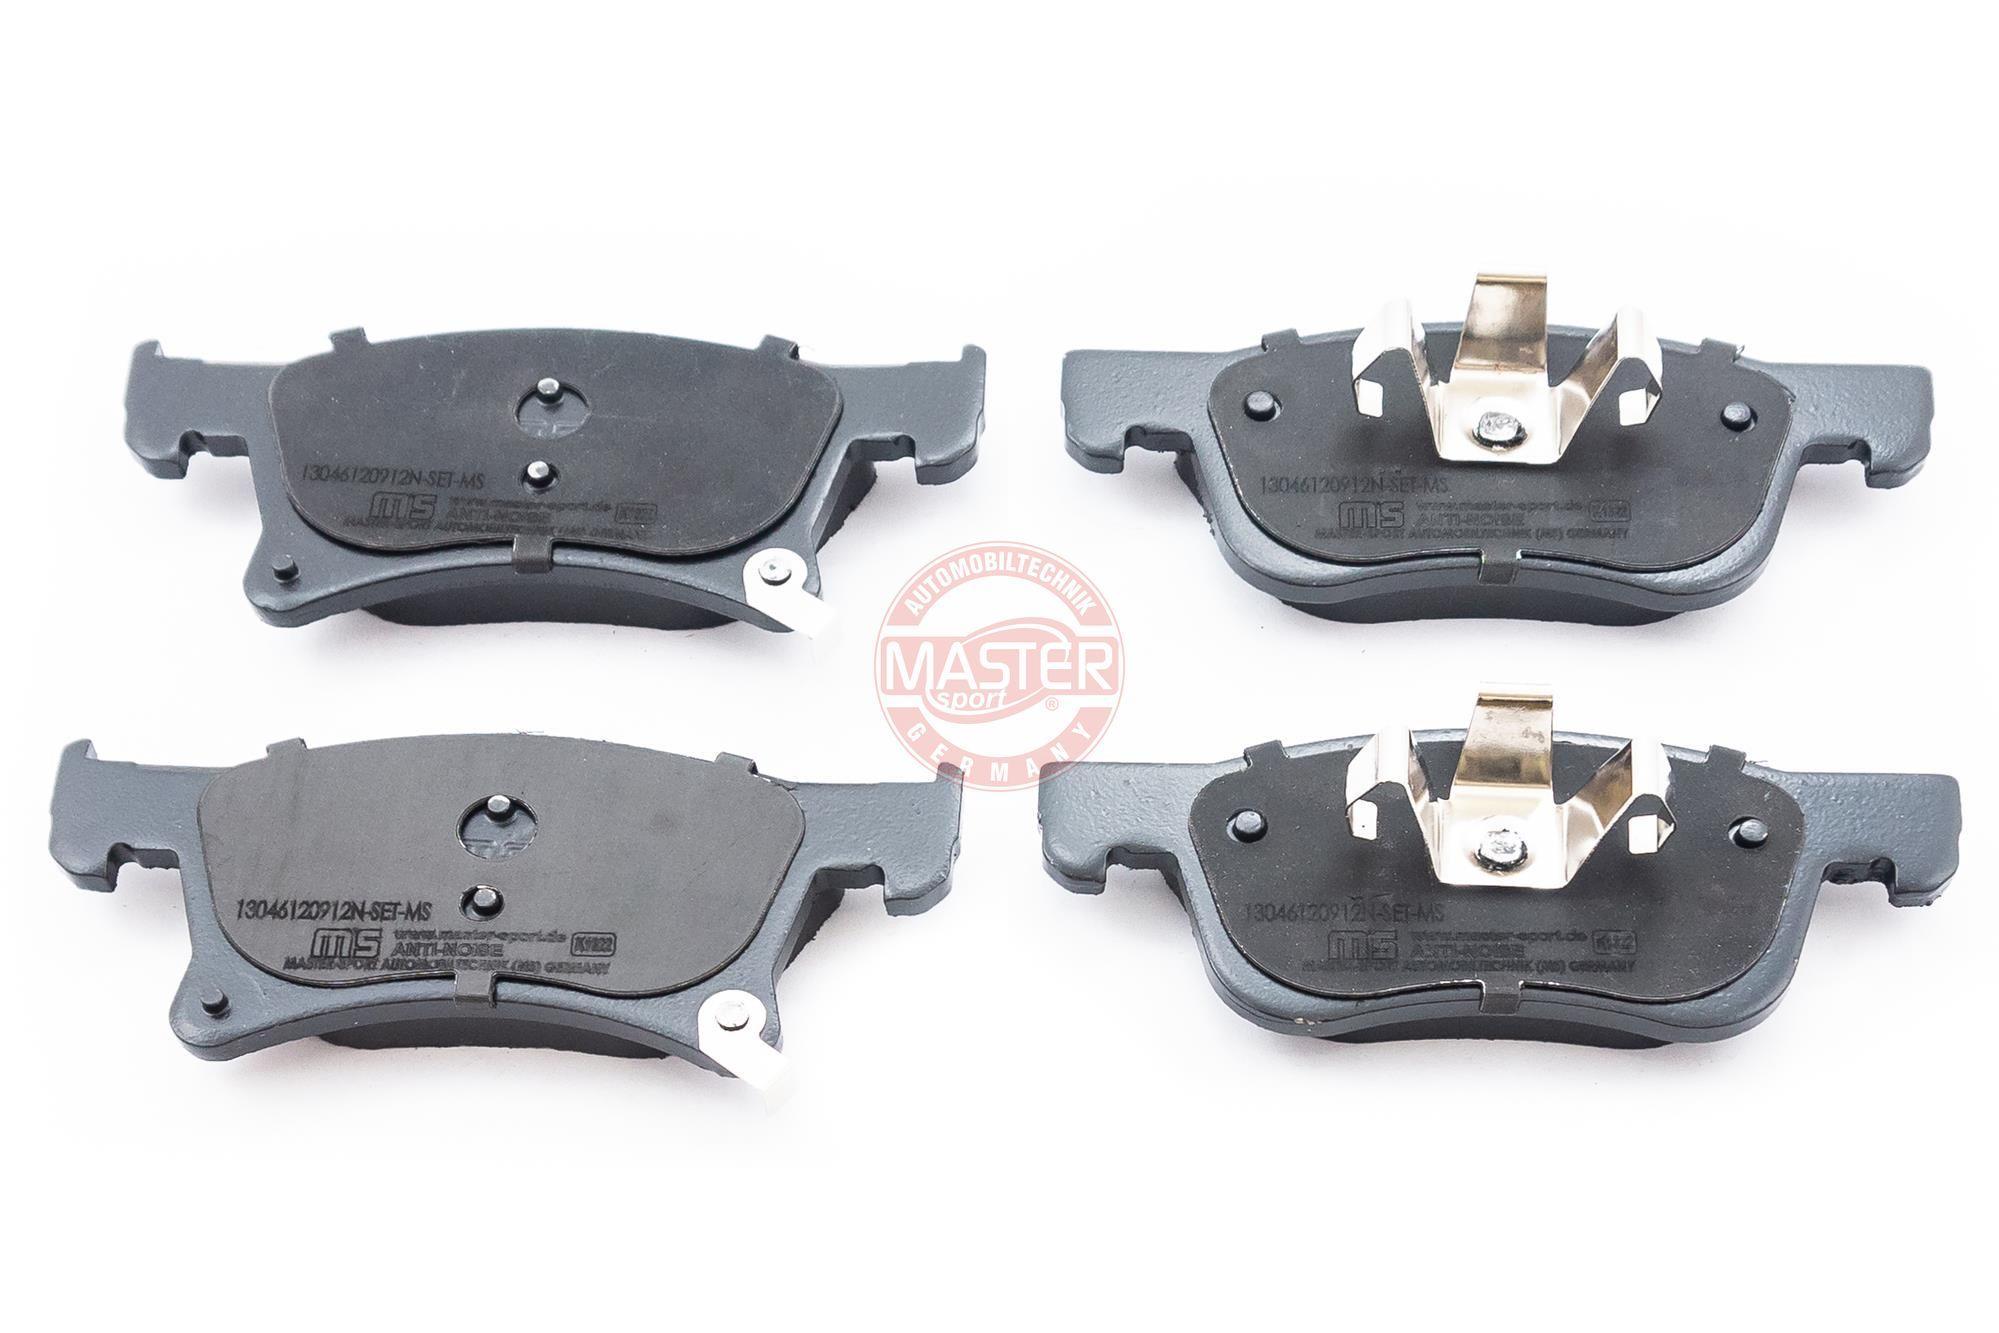 Bremsbeläge 13046120912N-SET-MS MASTER-SPORT 236120912 in Original Qualität